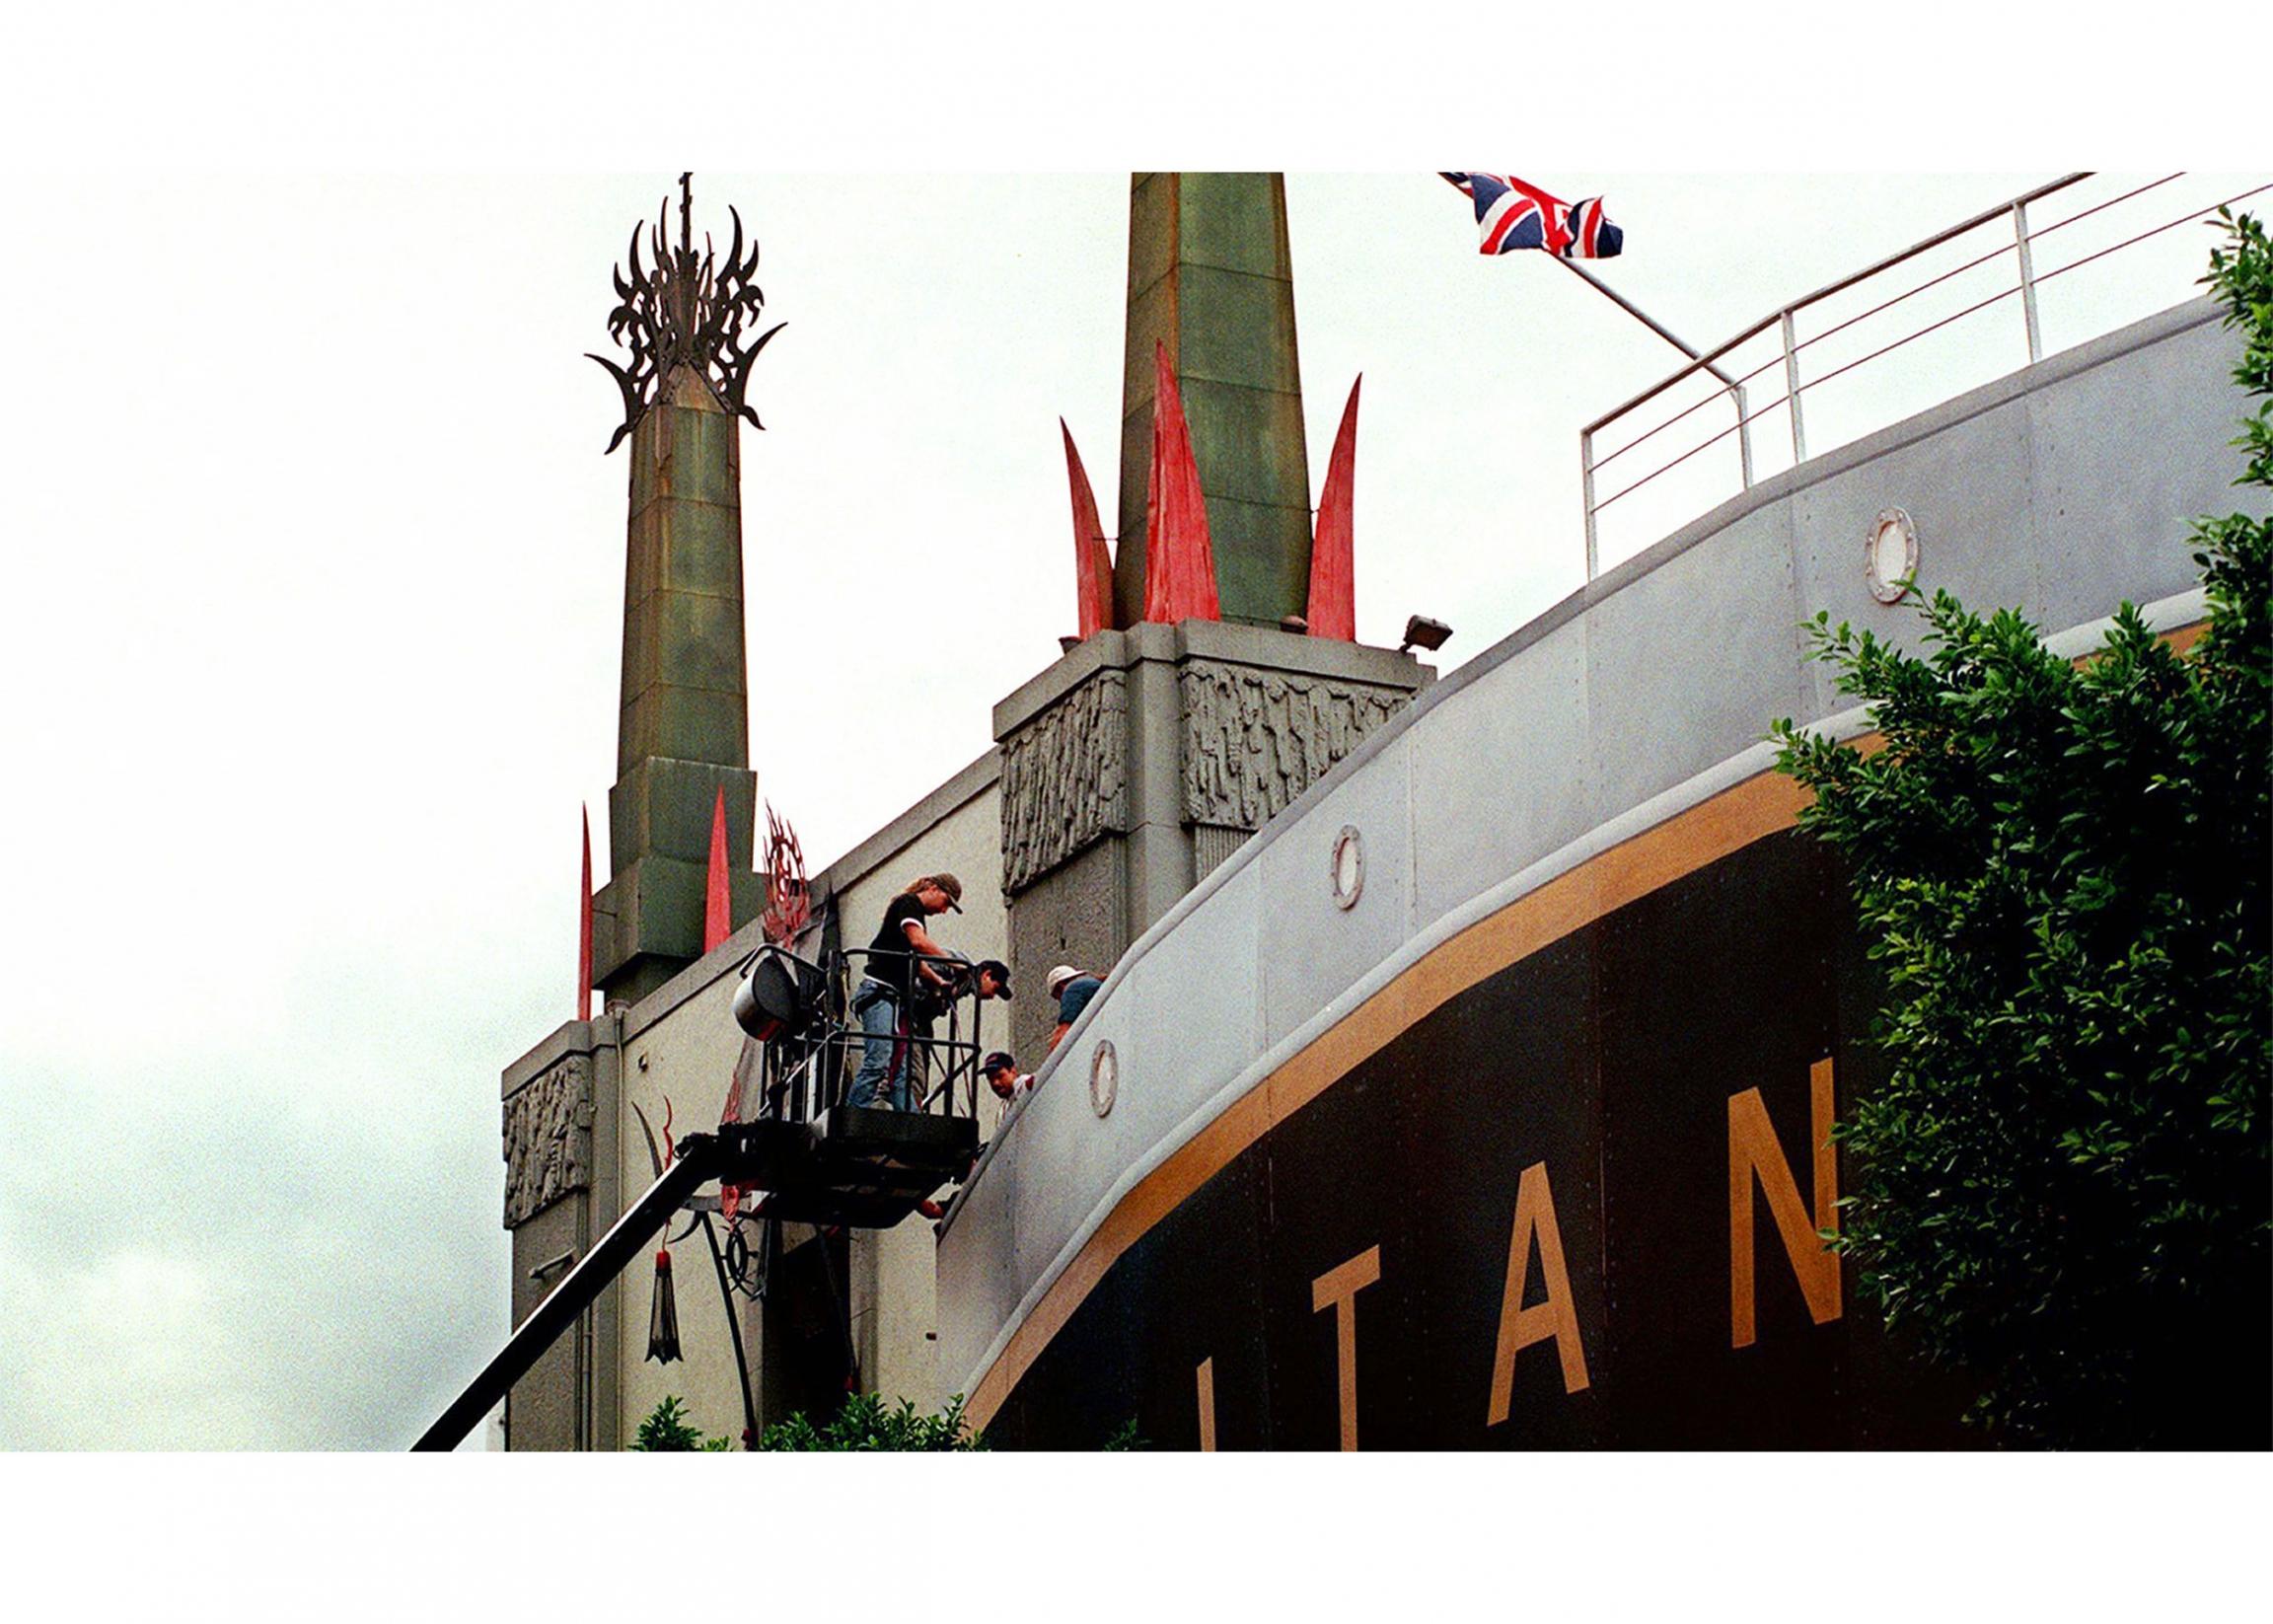 People working on a replica display of the Titanic